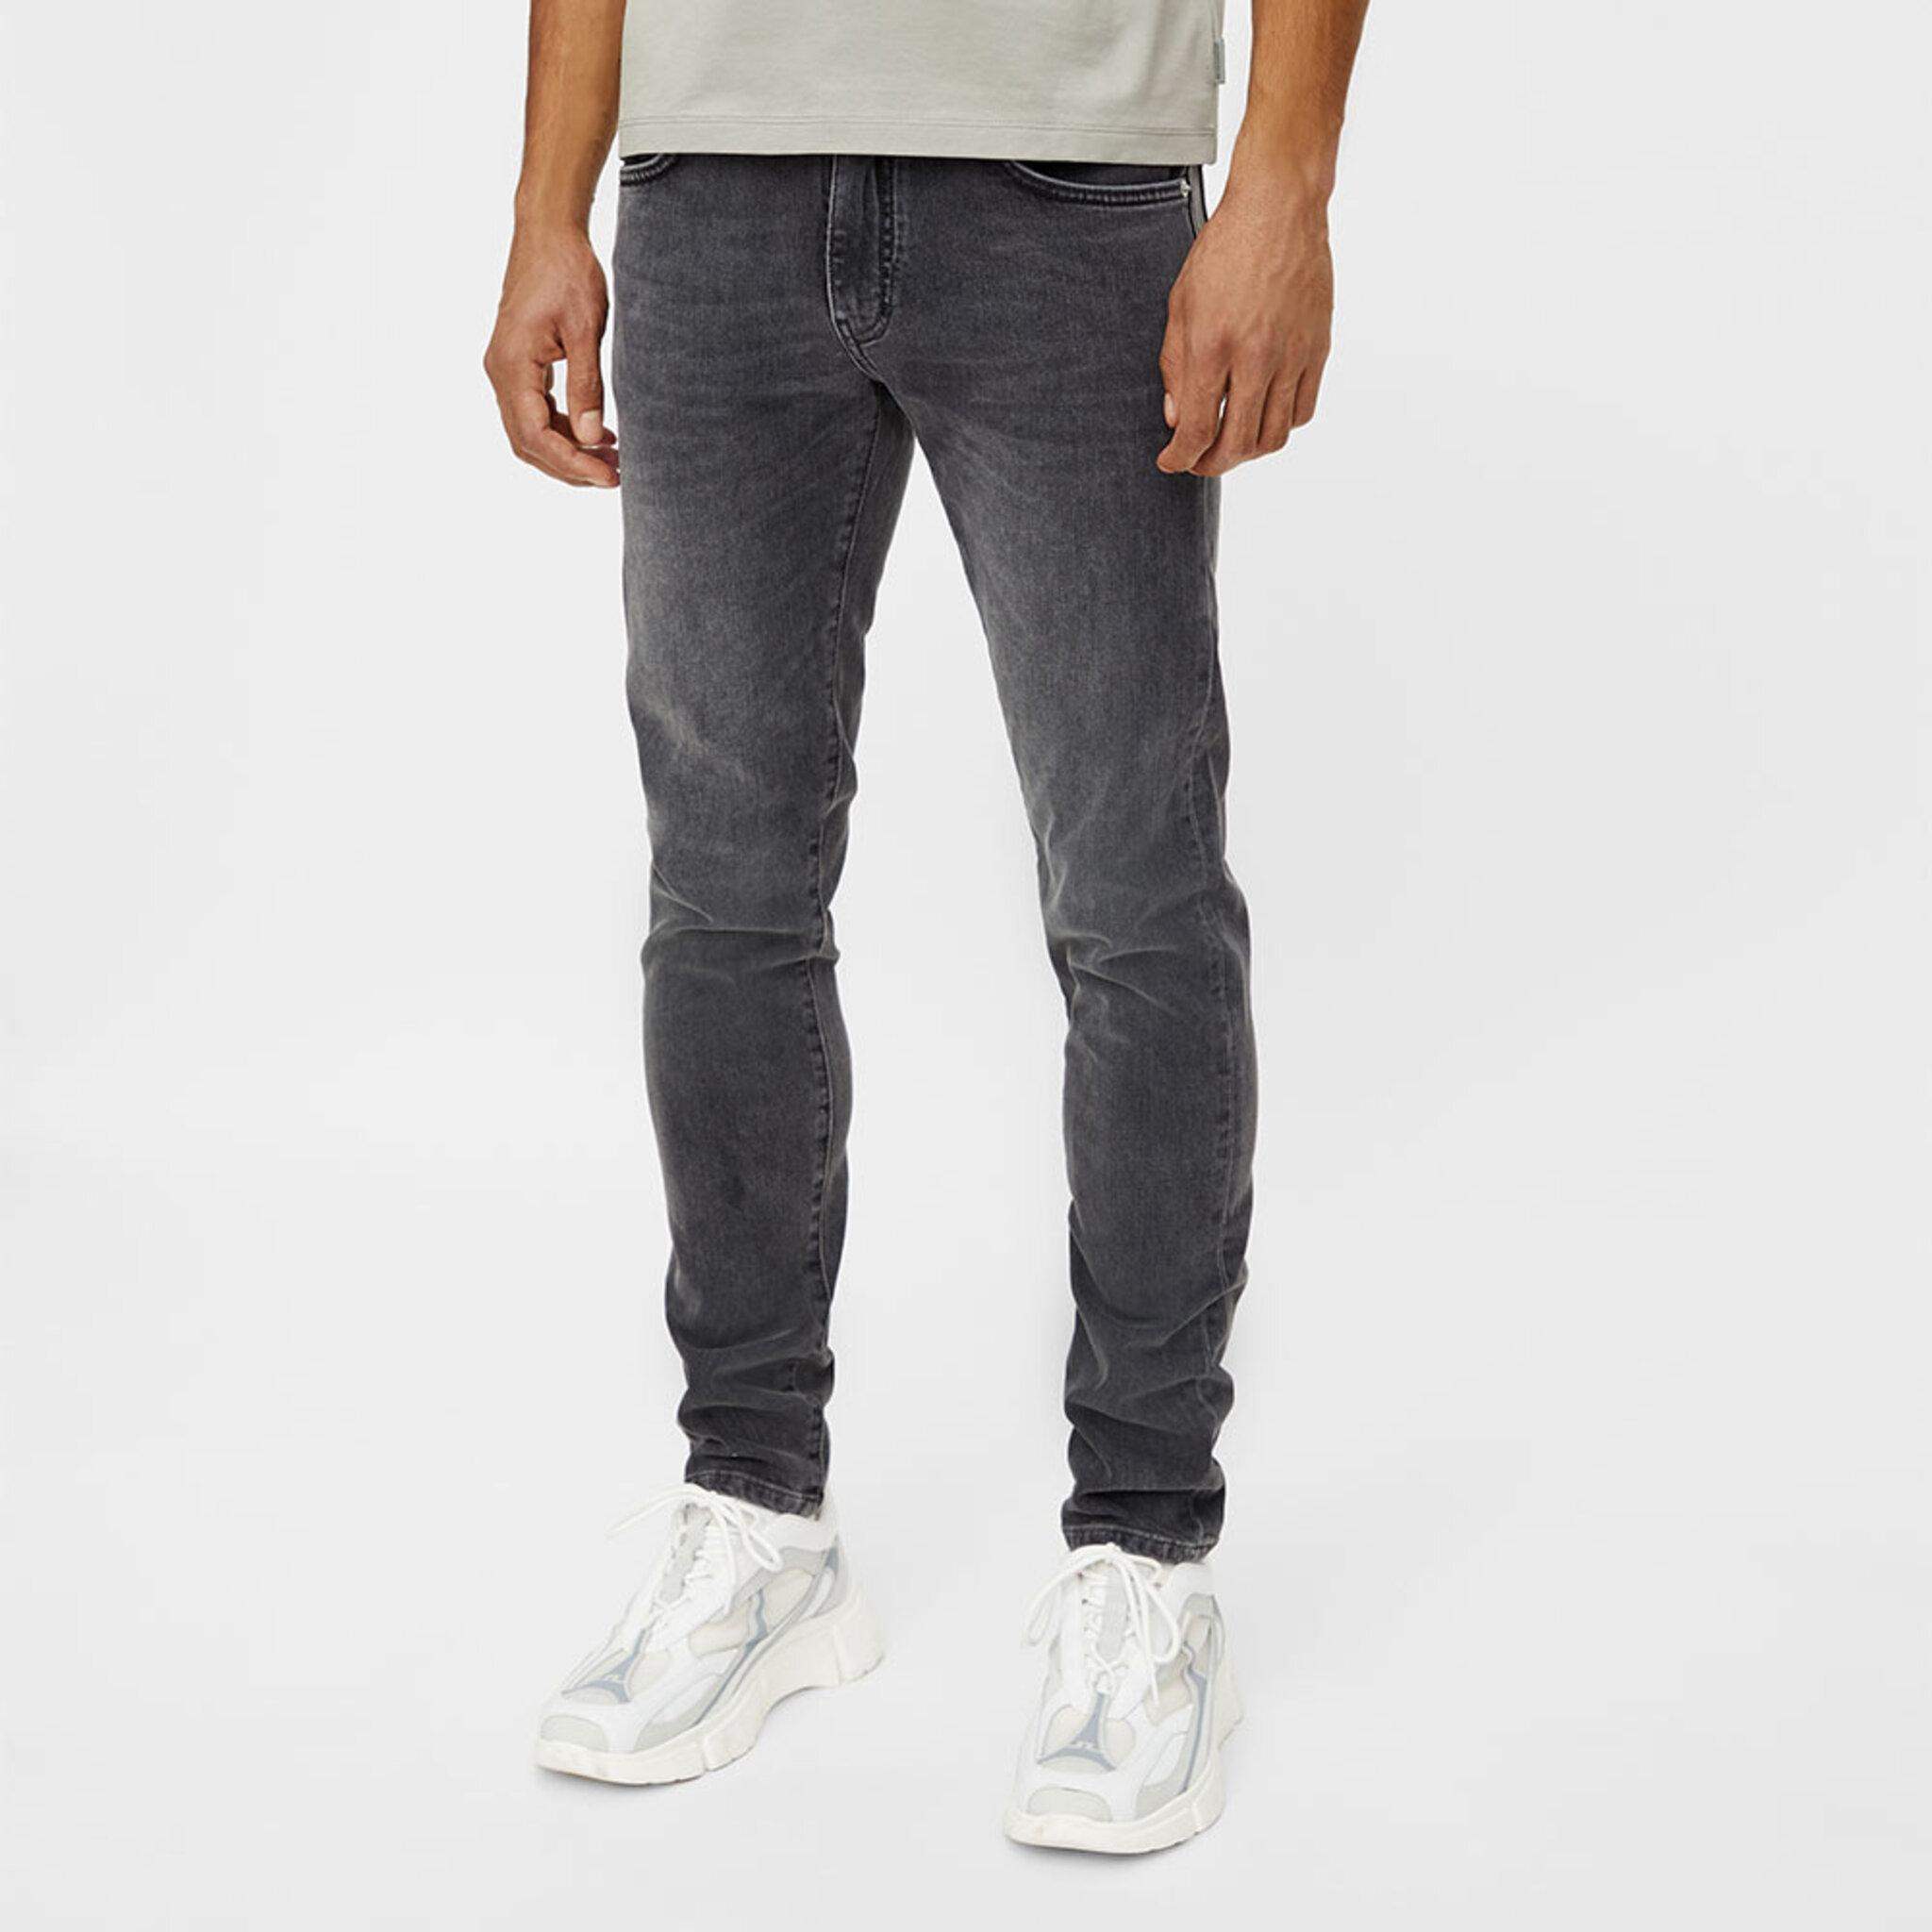 Jay Slate Washed Jeans